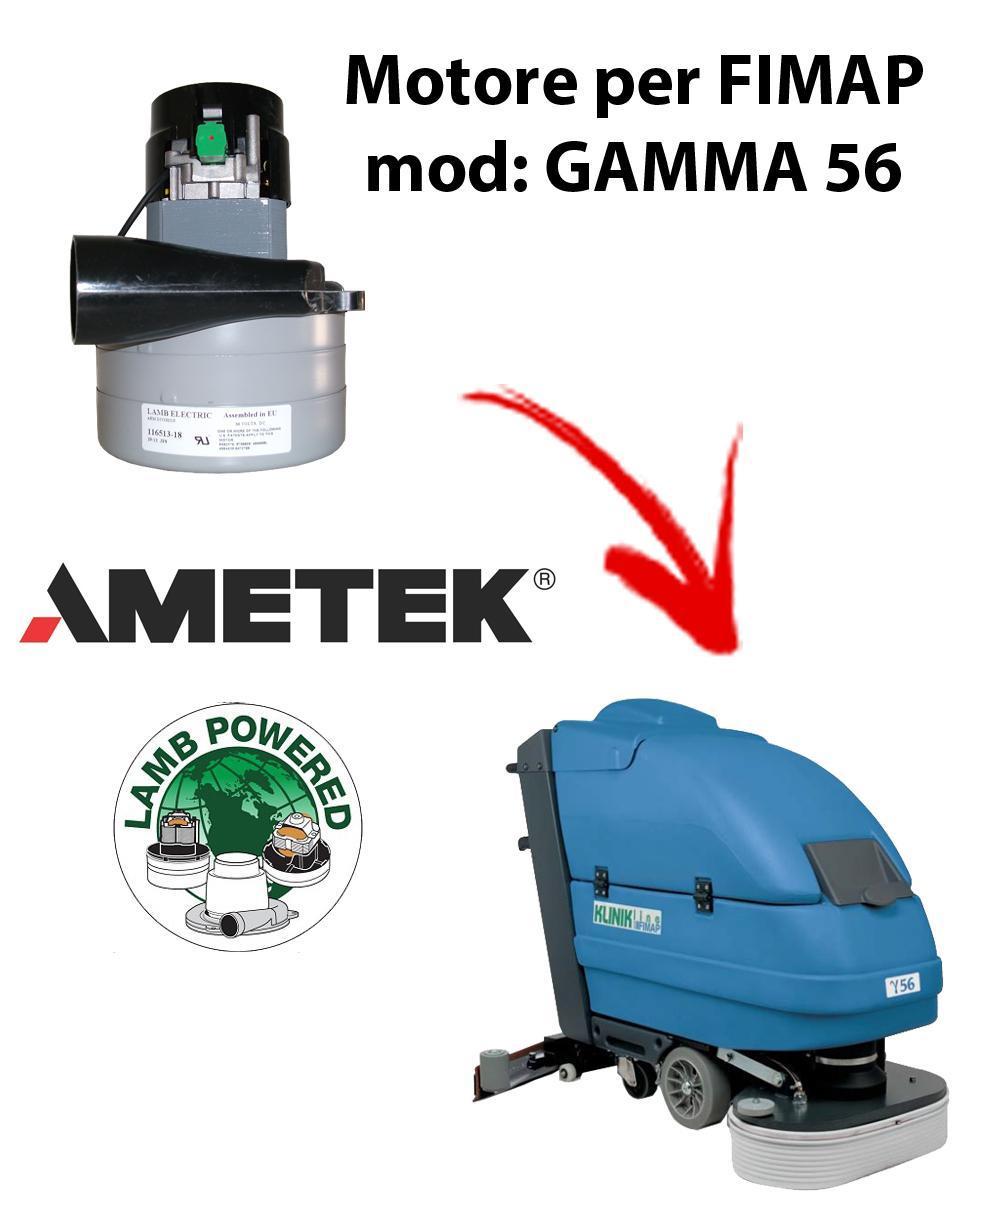 GAMMA 56 Motore de aspiración AMETEK para fregadora FIMAP